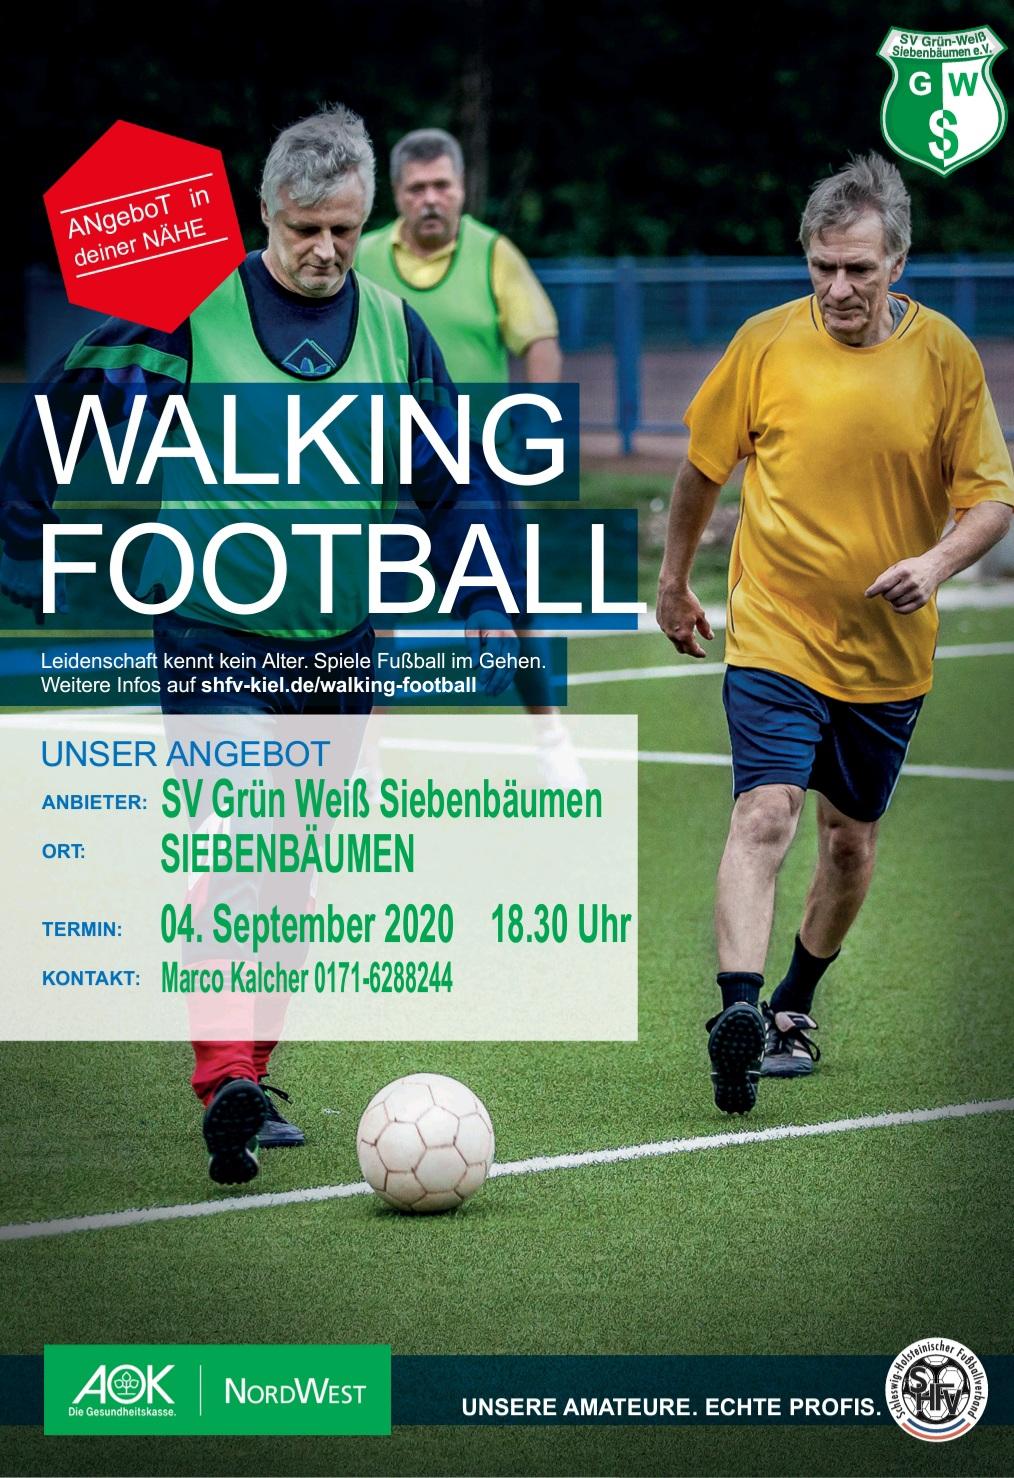 Walking Football (geh Fussball) beginnt in Siebenbäumen